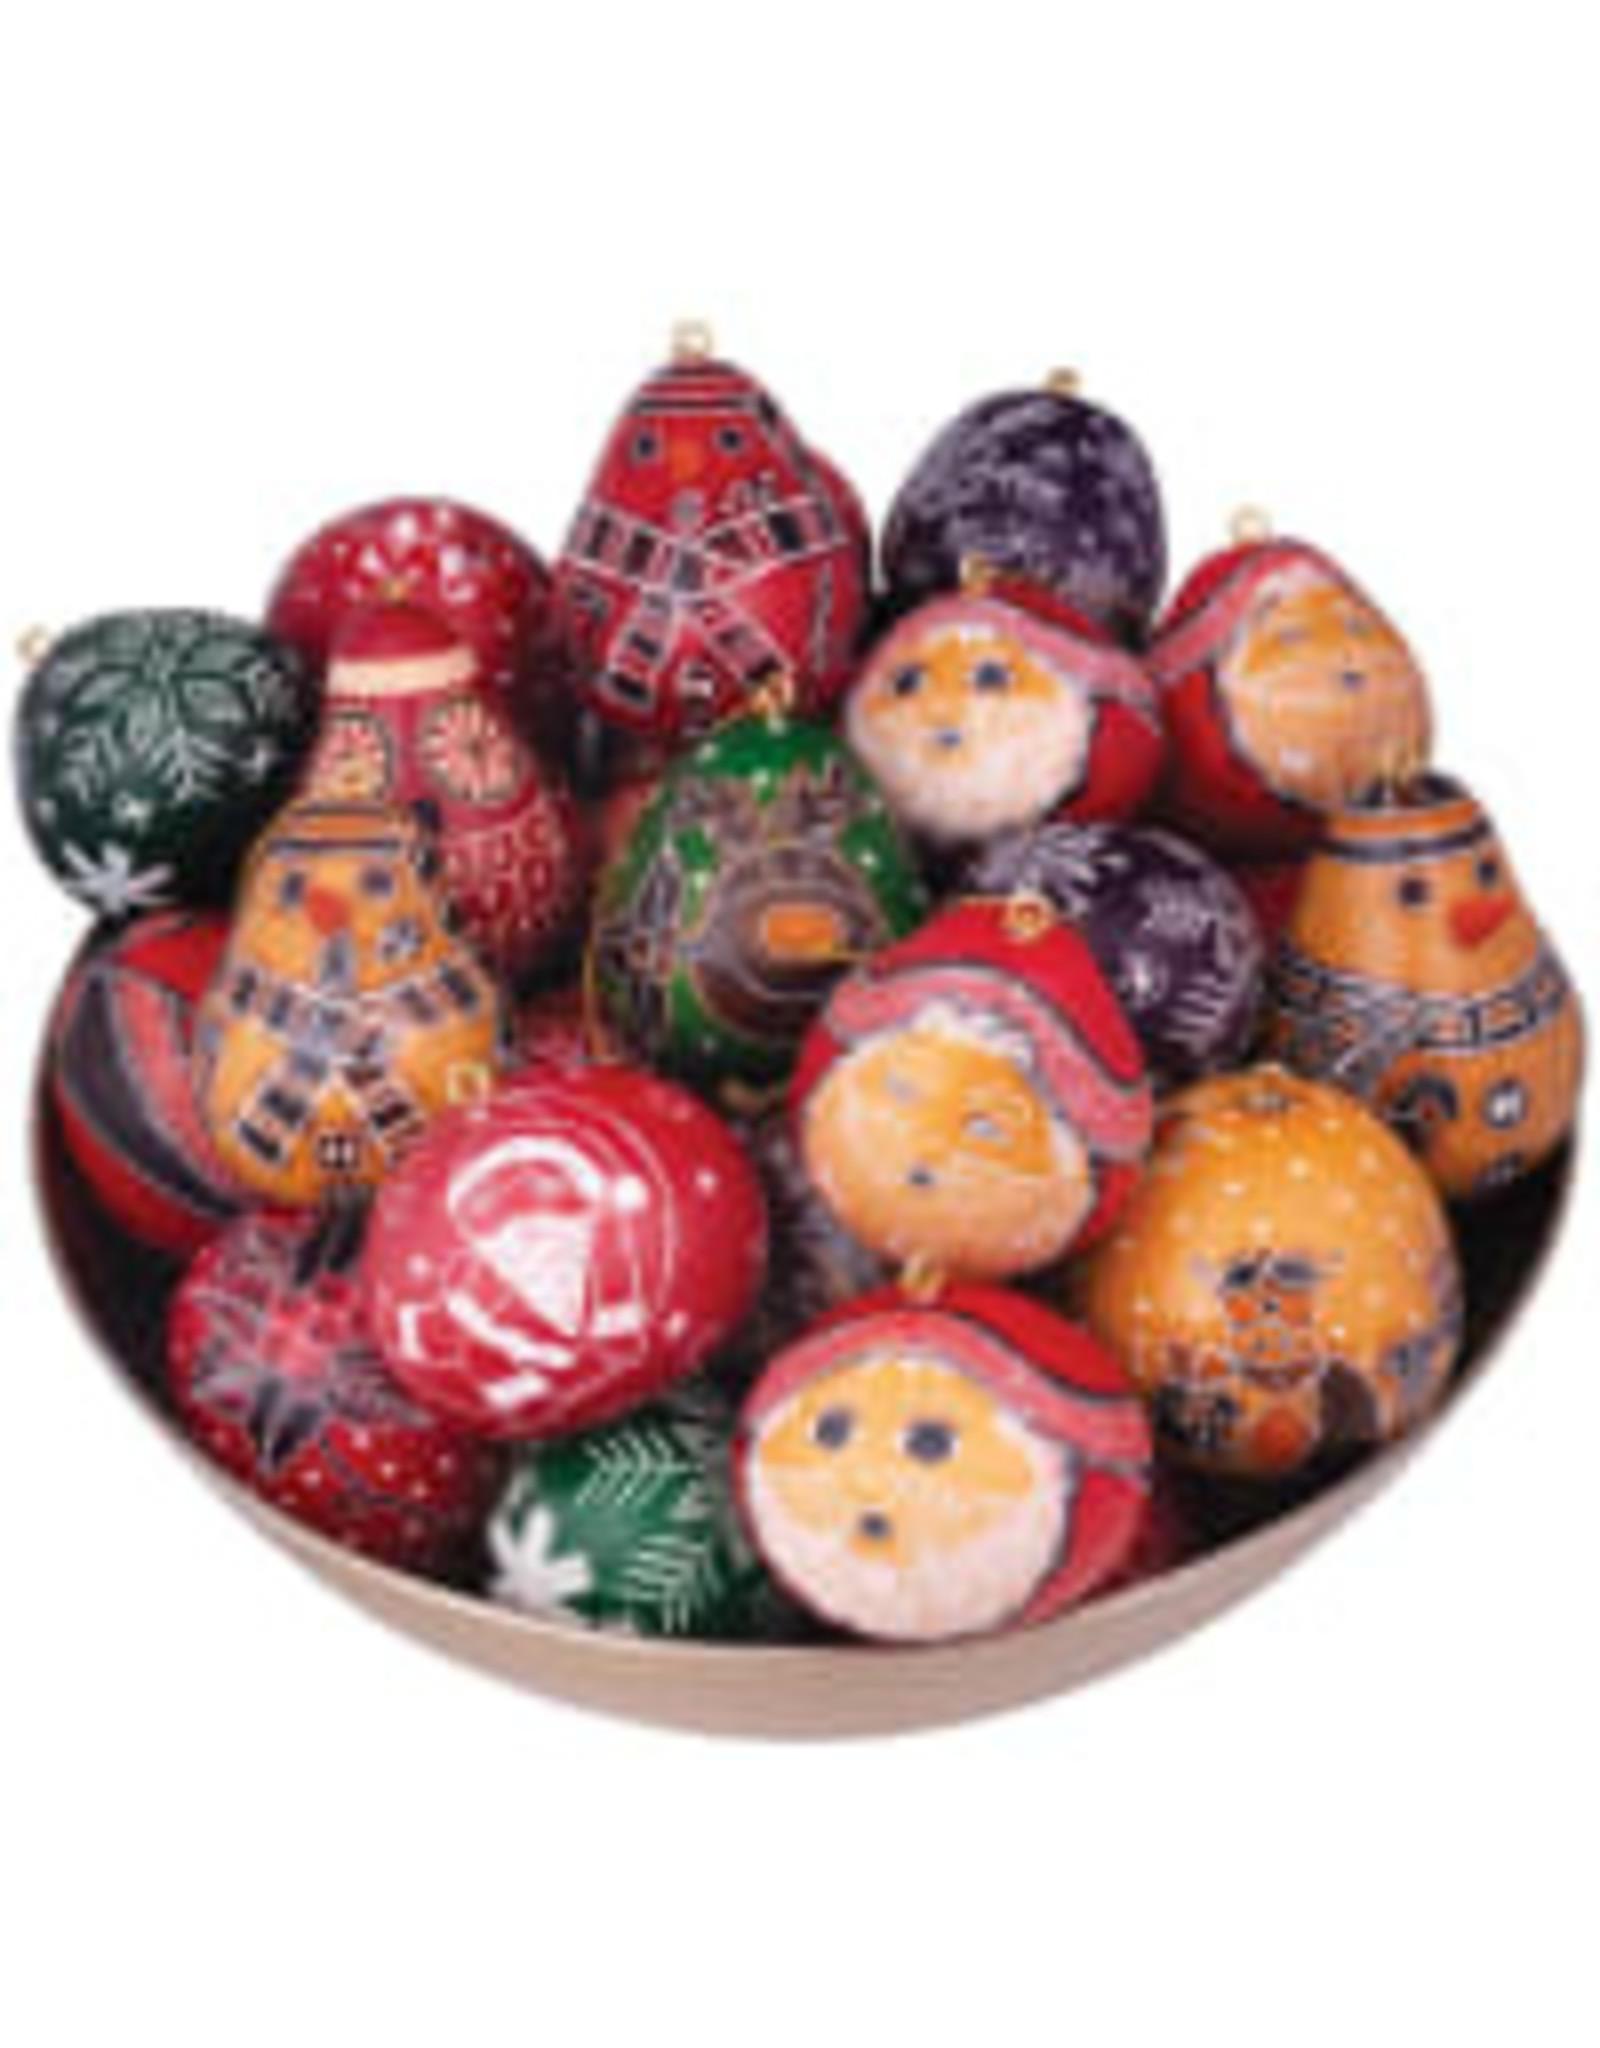 Christmas Mini Gourd Ornament, Peru